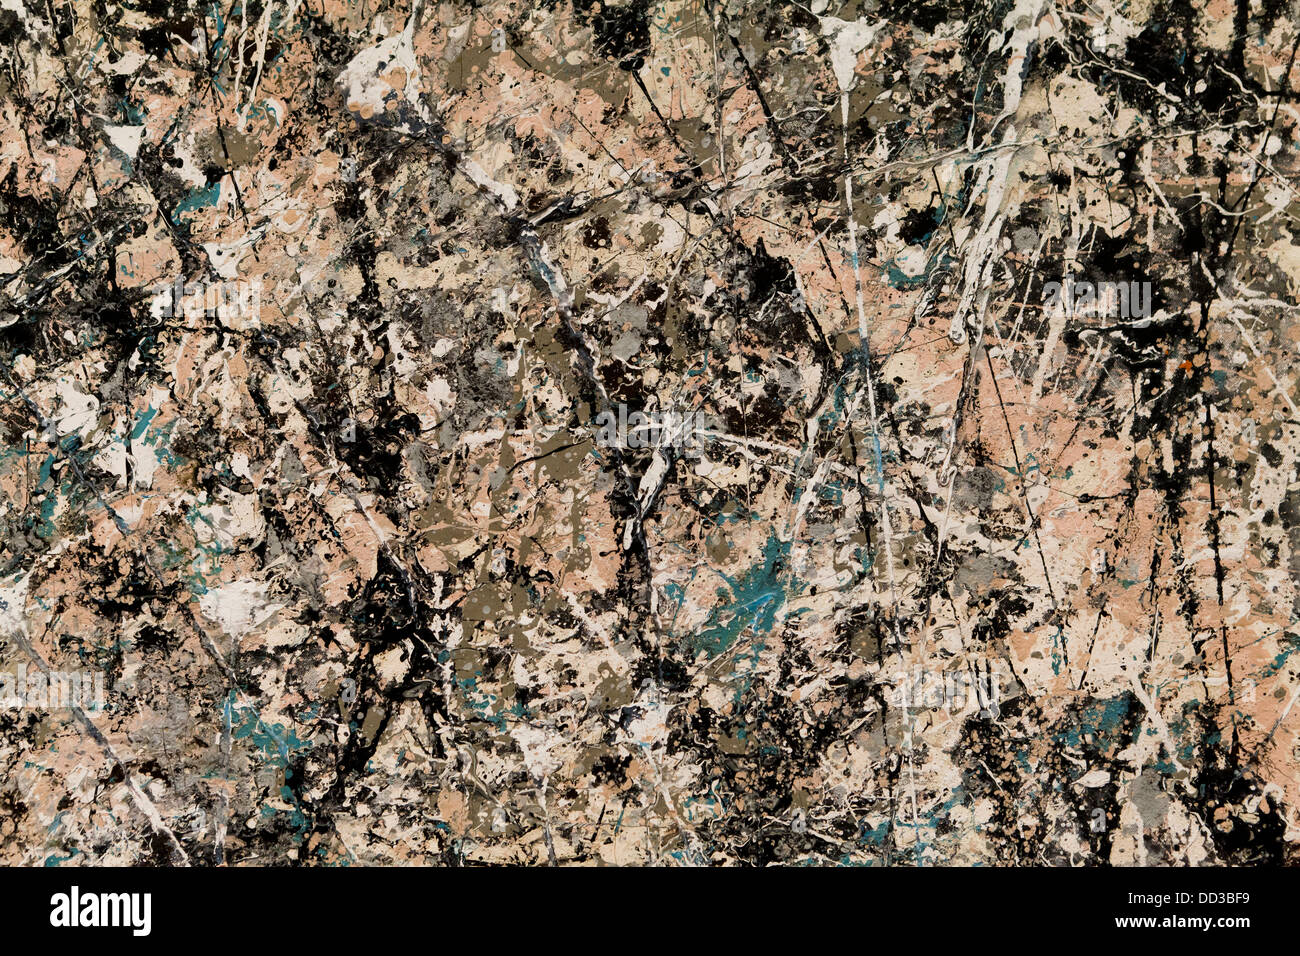 'Número 1 (Lavanda) neblina' de Jackson Pollock, 1950 Imagen De Stock